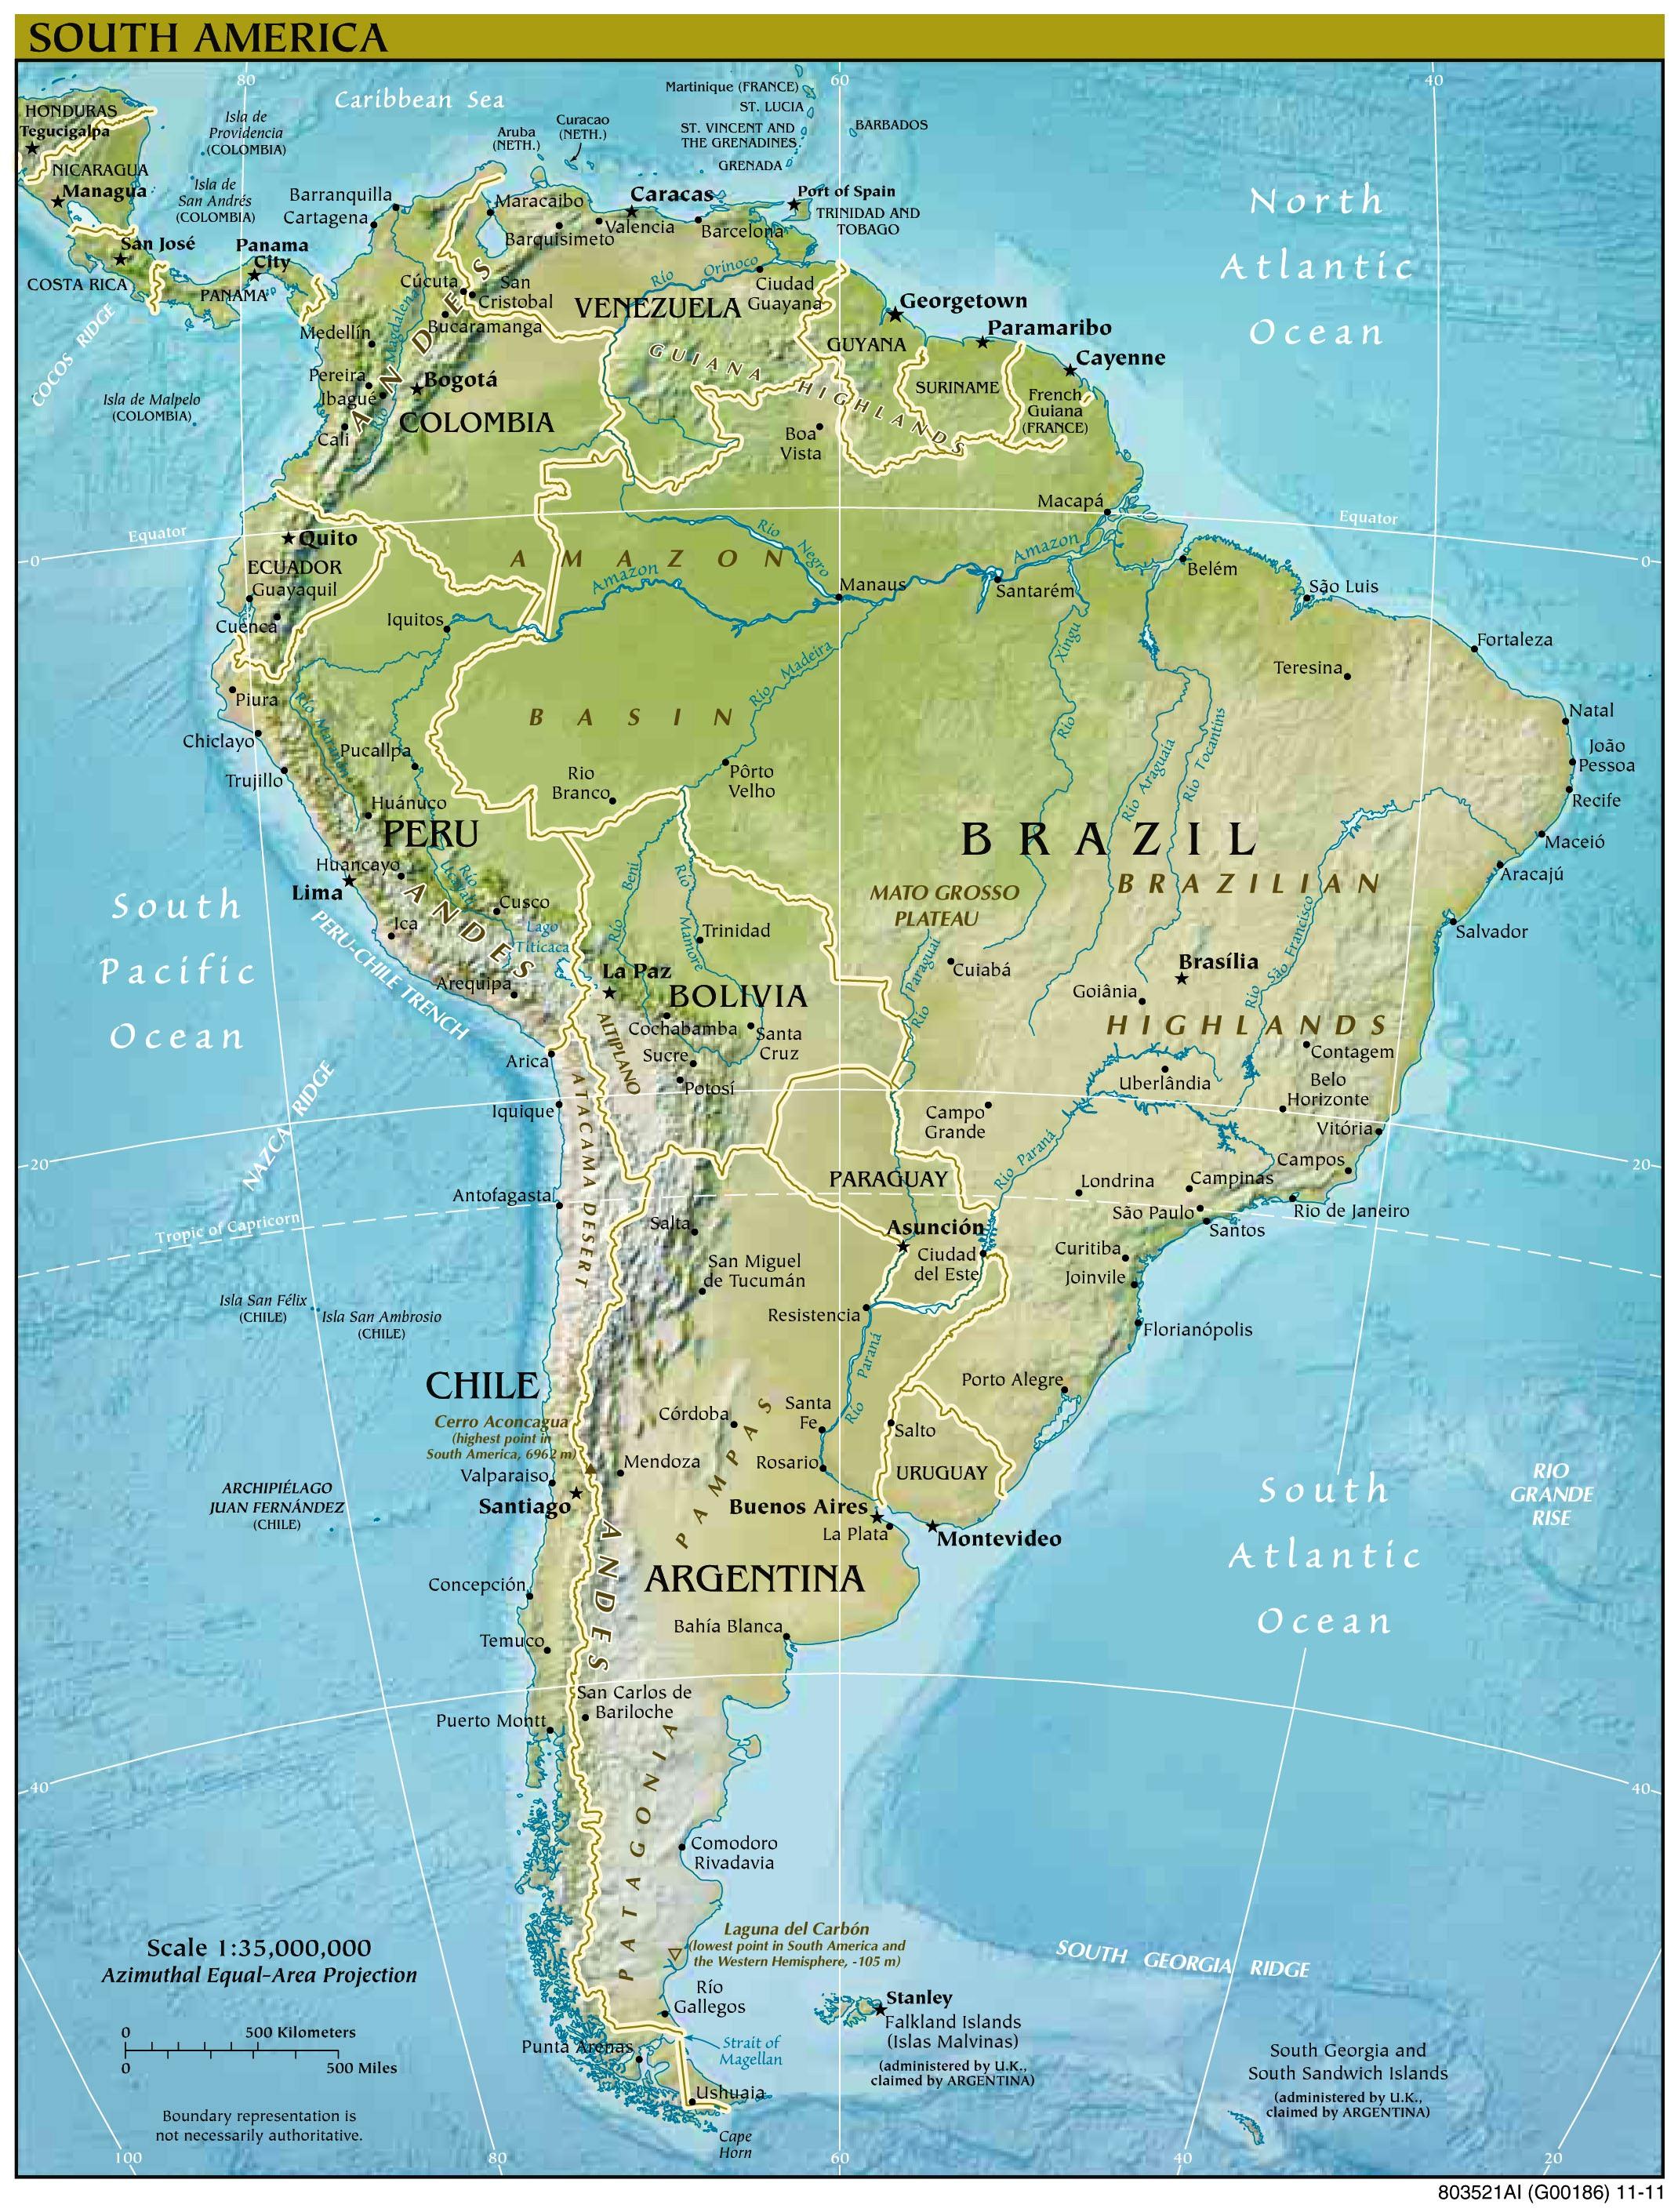 weltkarte südamerika Südamerika | Landkarten kostenlos – Cliparts kostenlos weltkarte südamerika